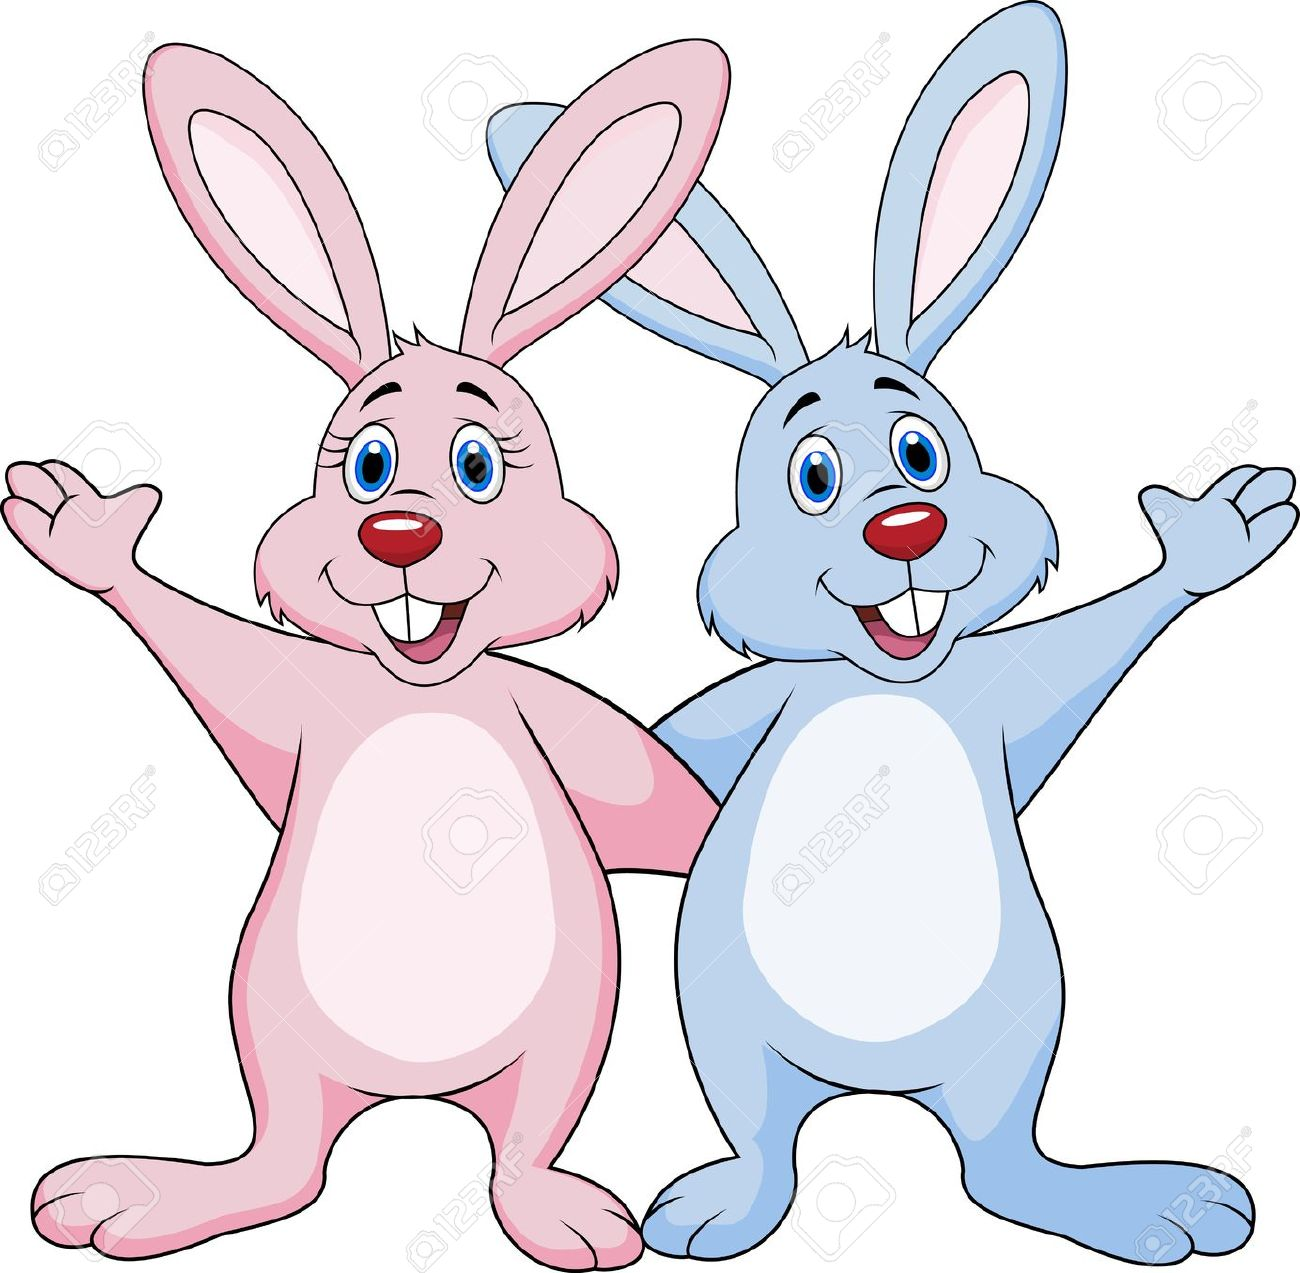 Cartoon rabbits clipart.